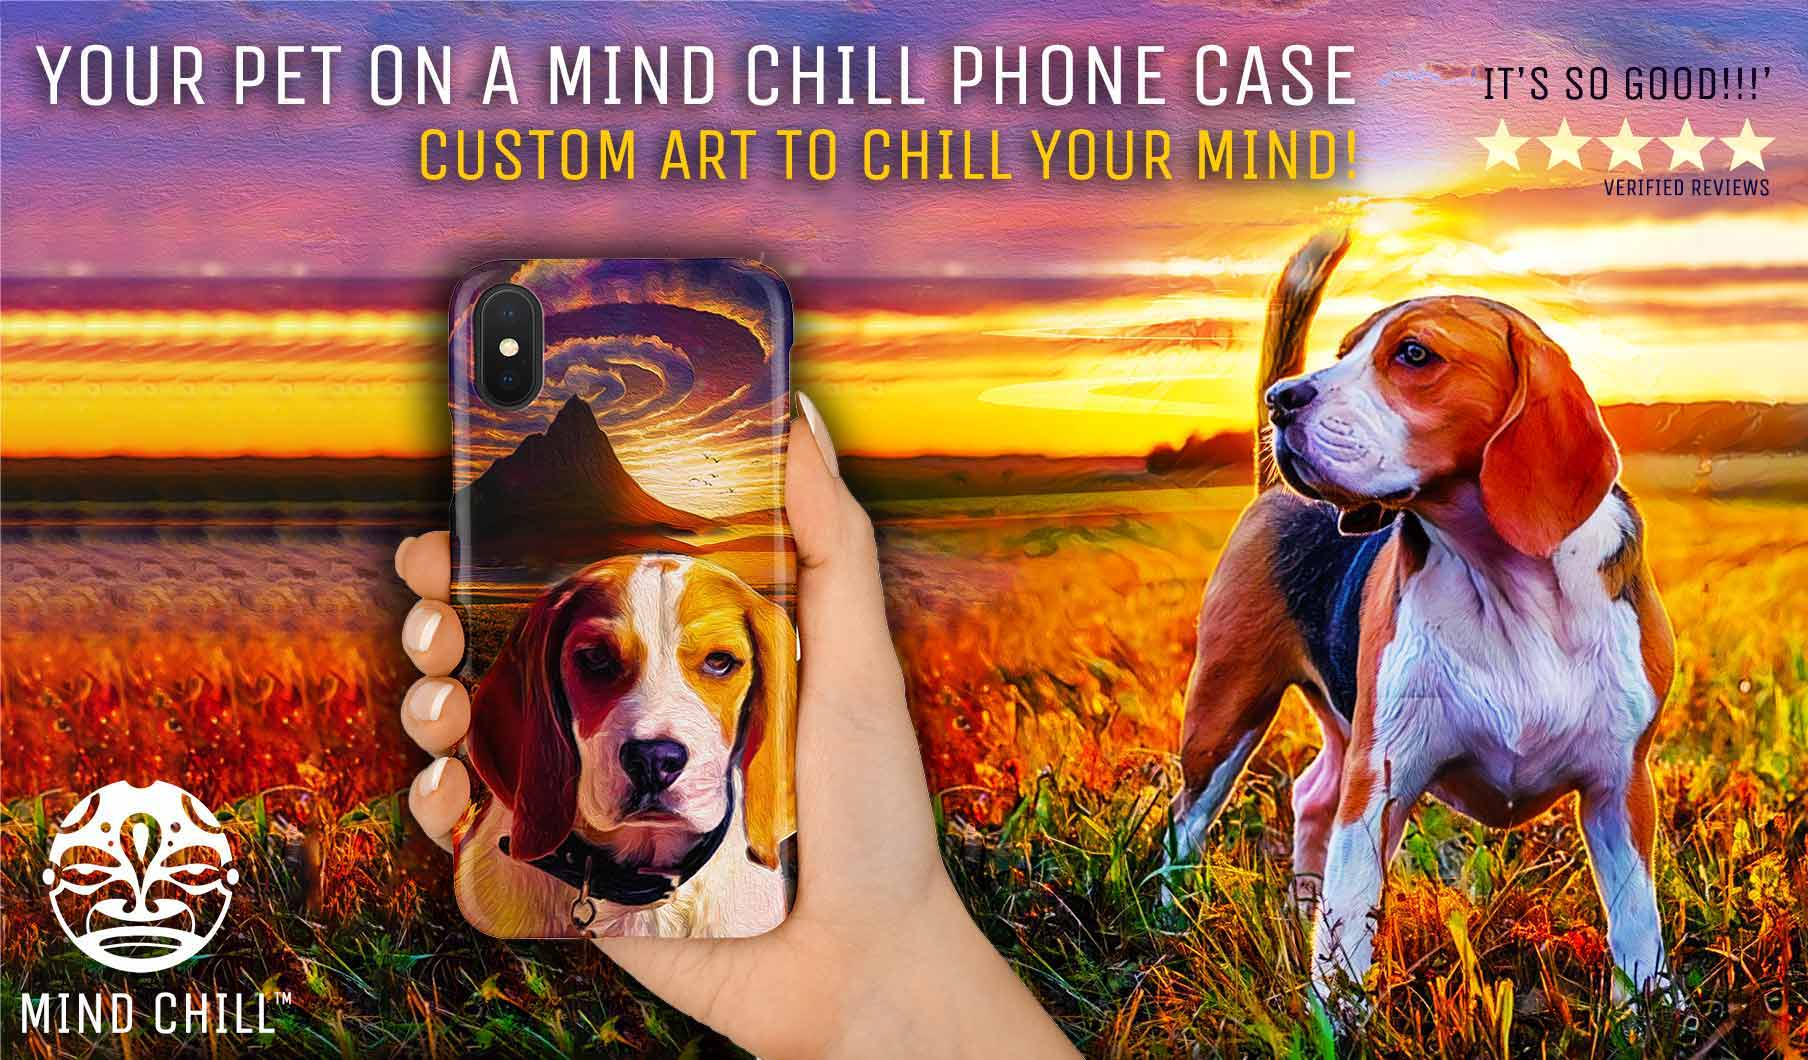 Mind Chill custom pet portrait phone cases